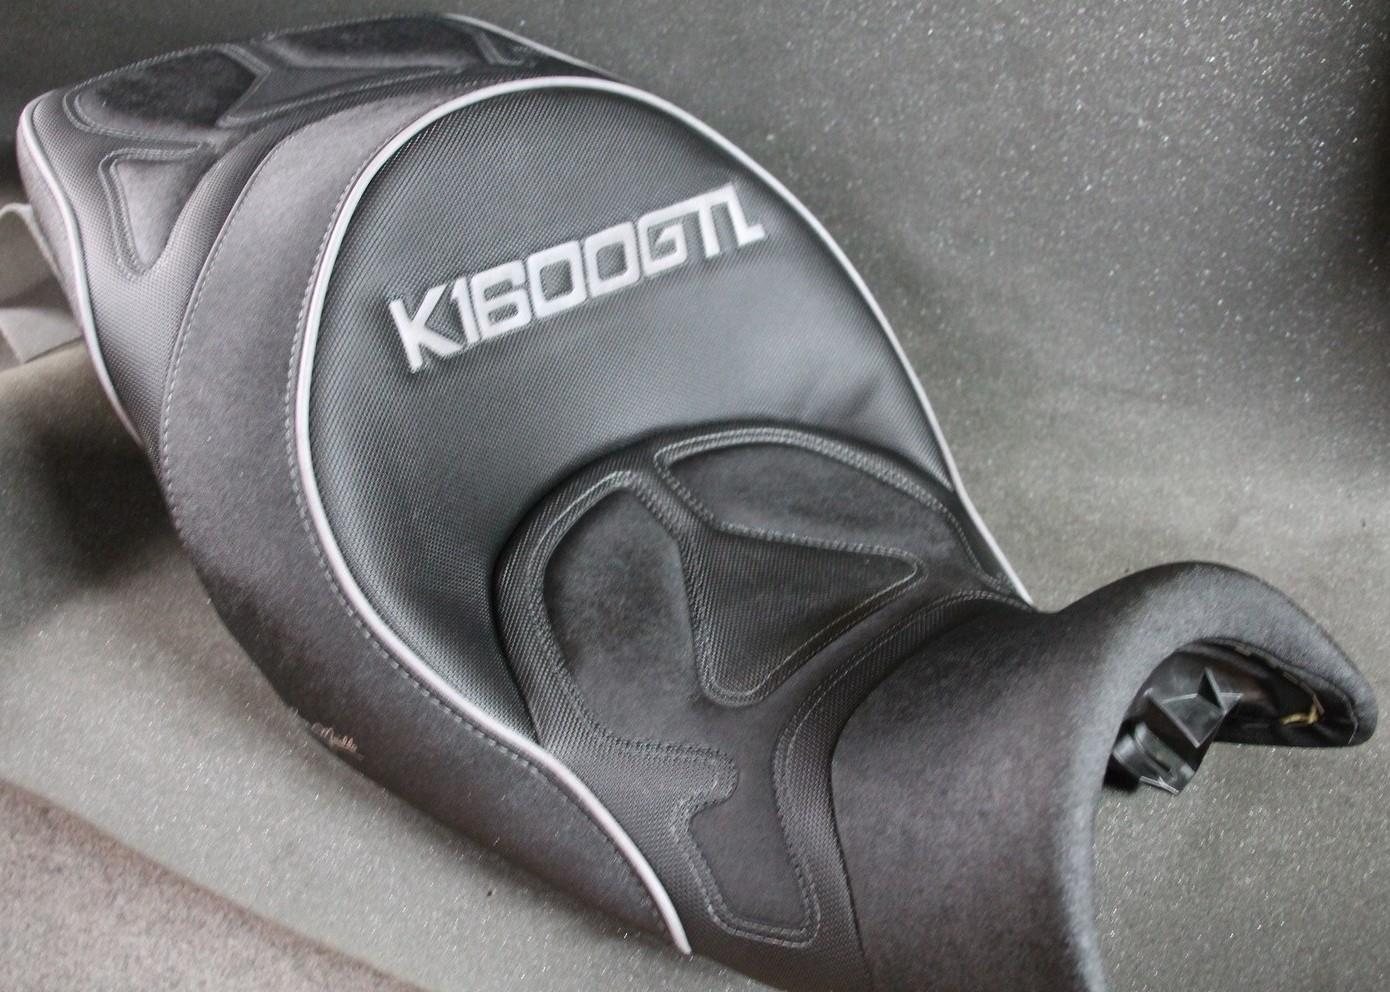 K1600